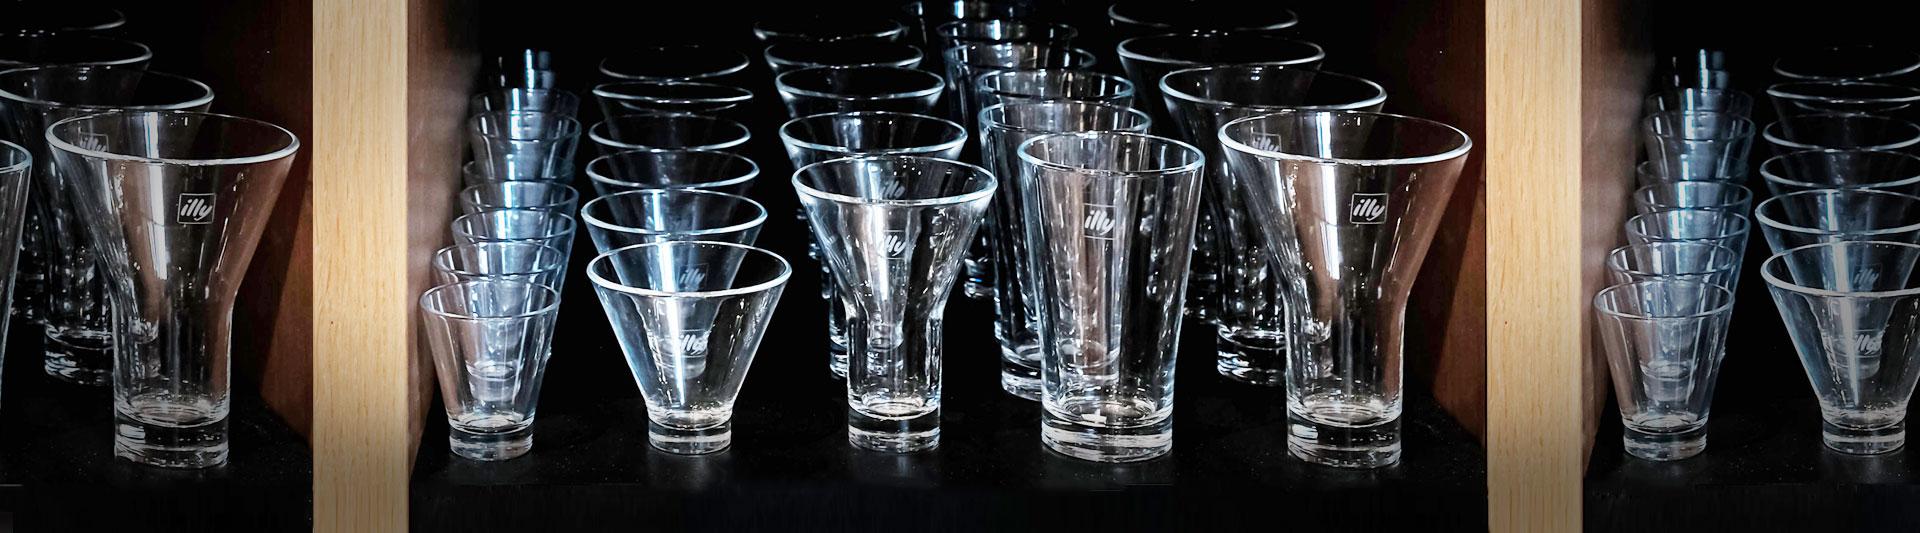 ספלי זכוכית